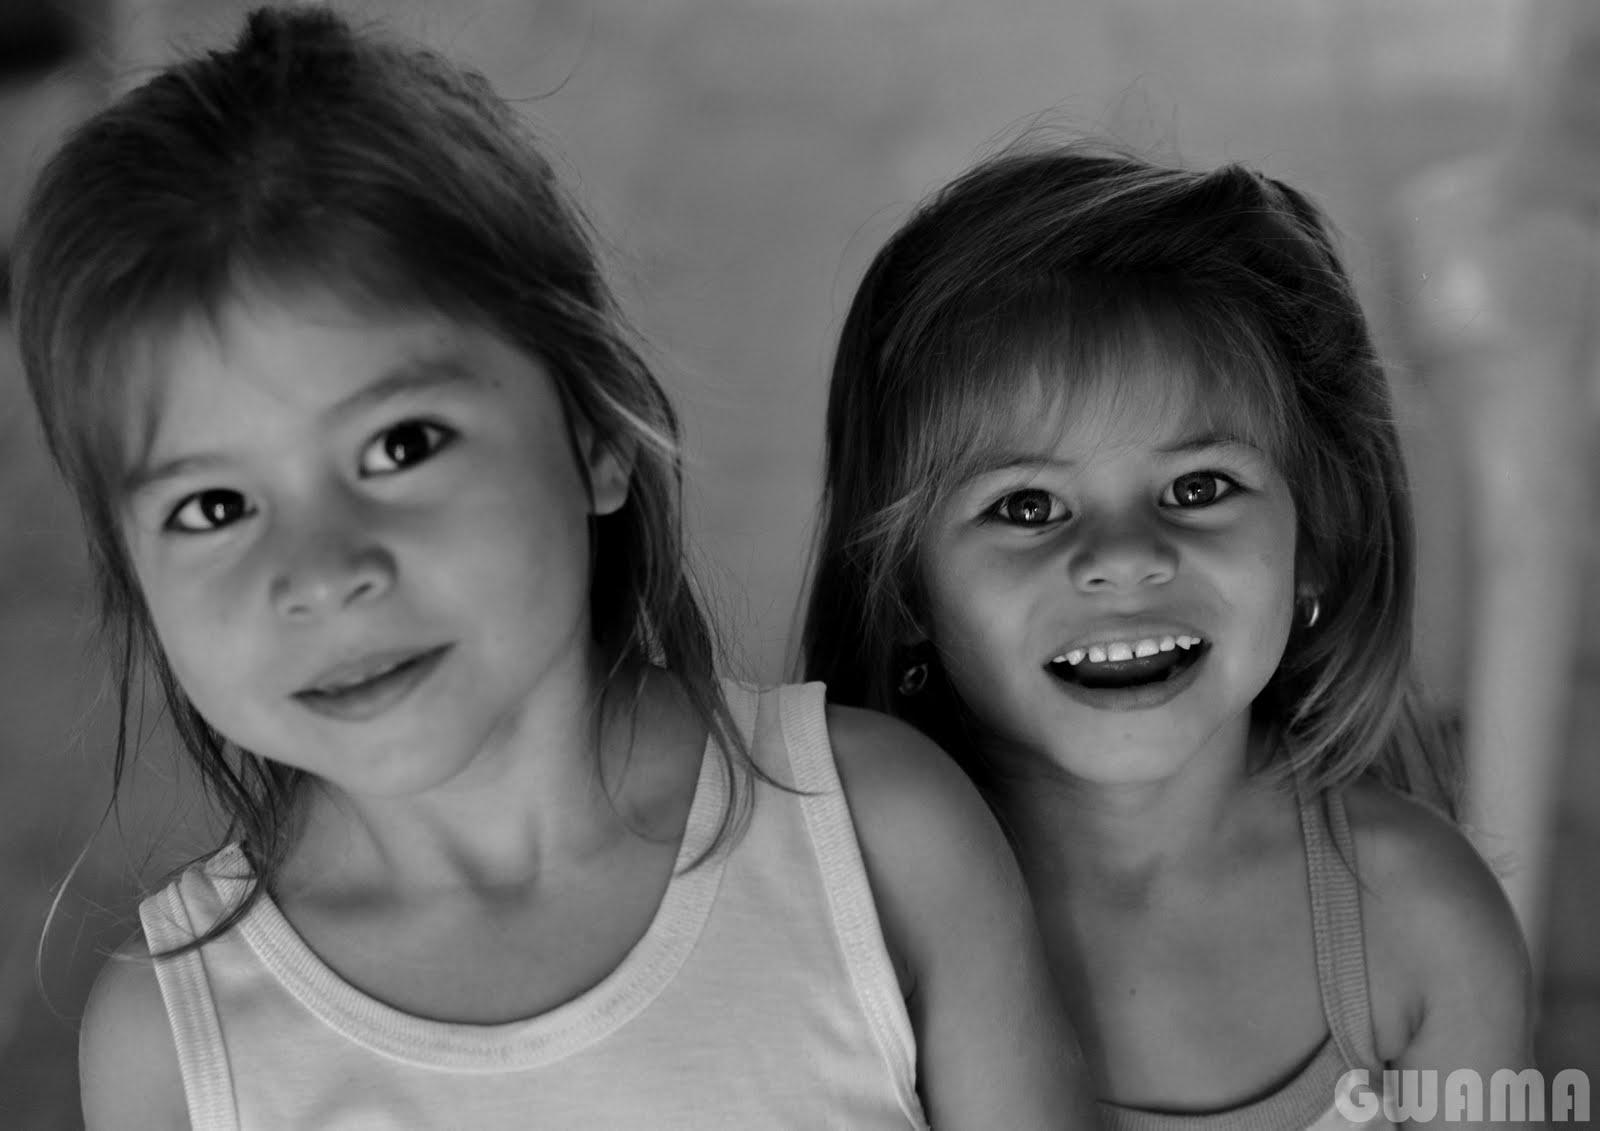 ENFANTS DU MONDE-NIÑOS DEL MUNDO-CHILDREN OF THE WORLD